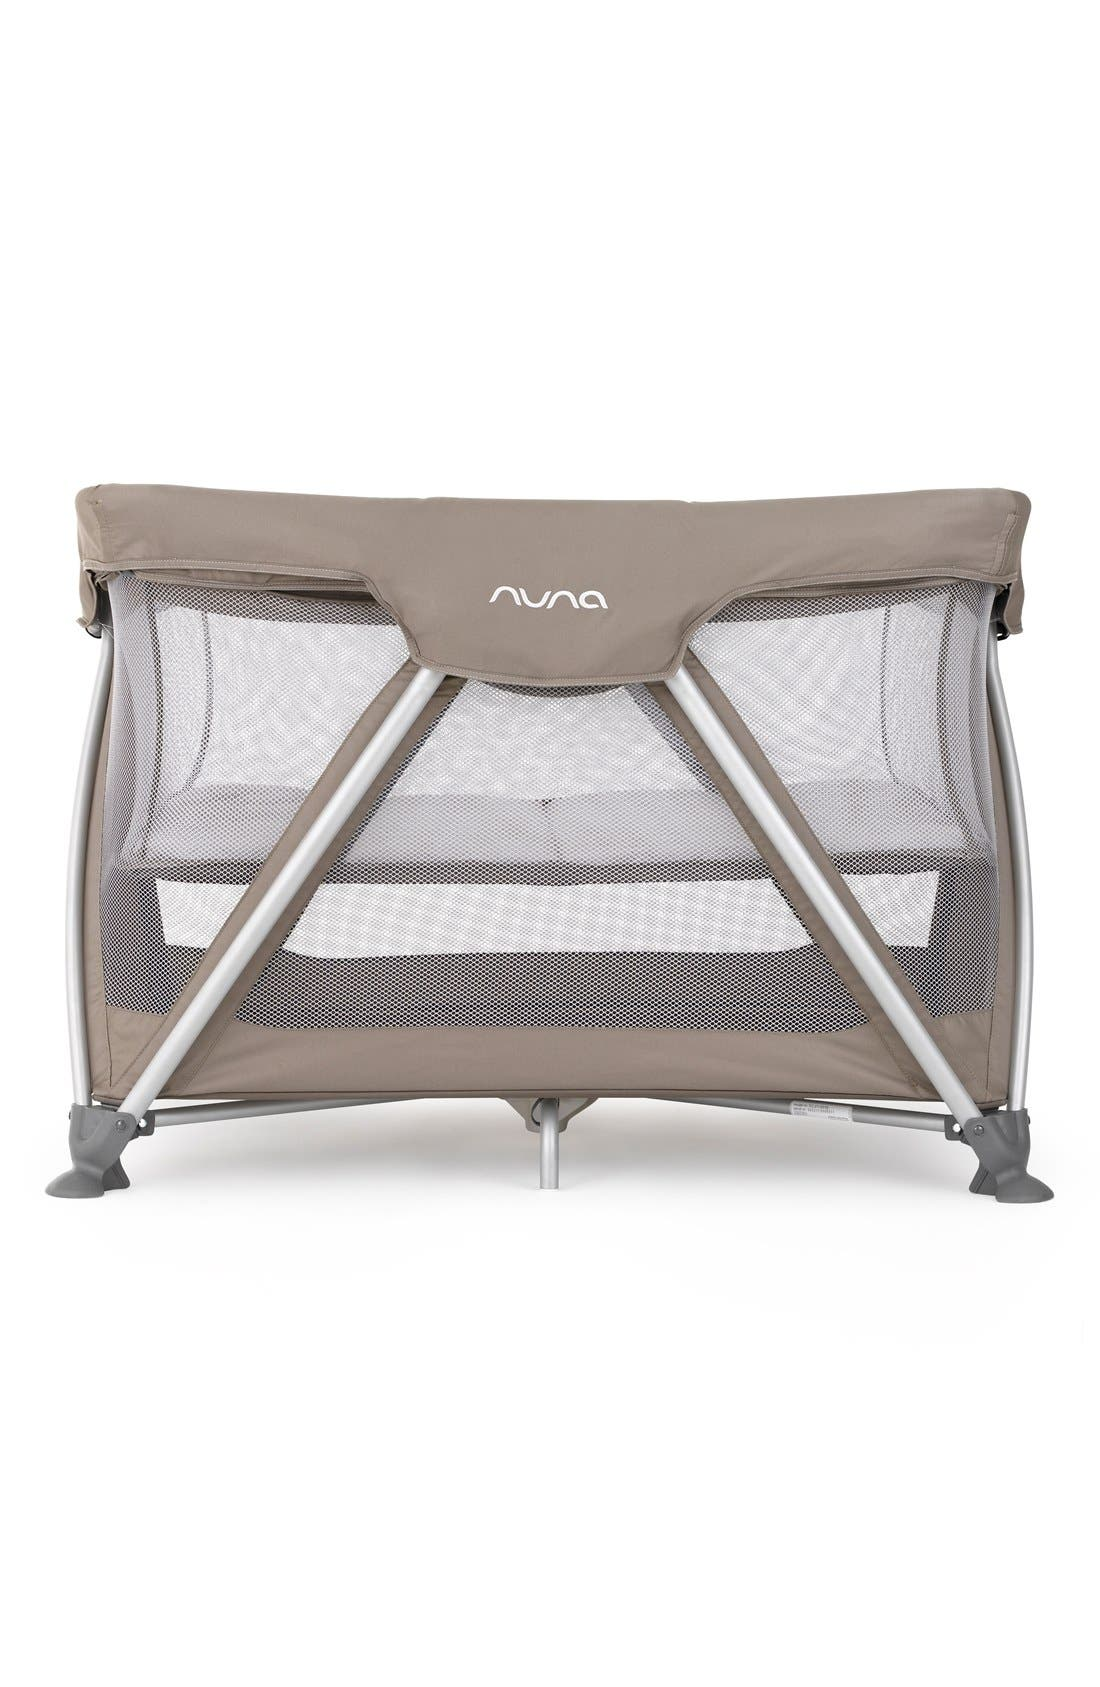 'SENA<sup>™</sup>' Travel Crib,                         Main,                         color, Safari